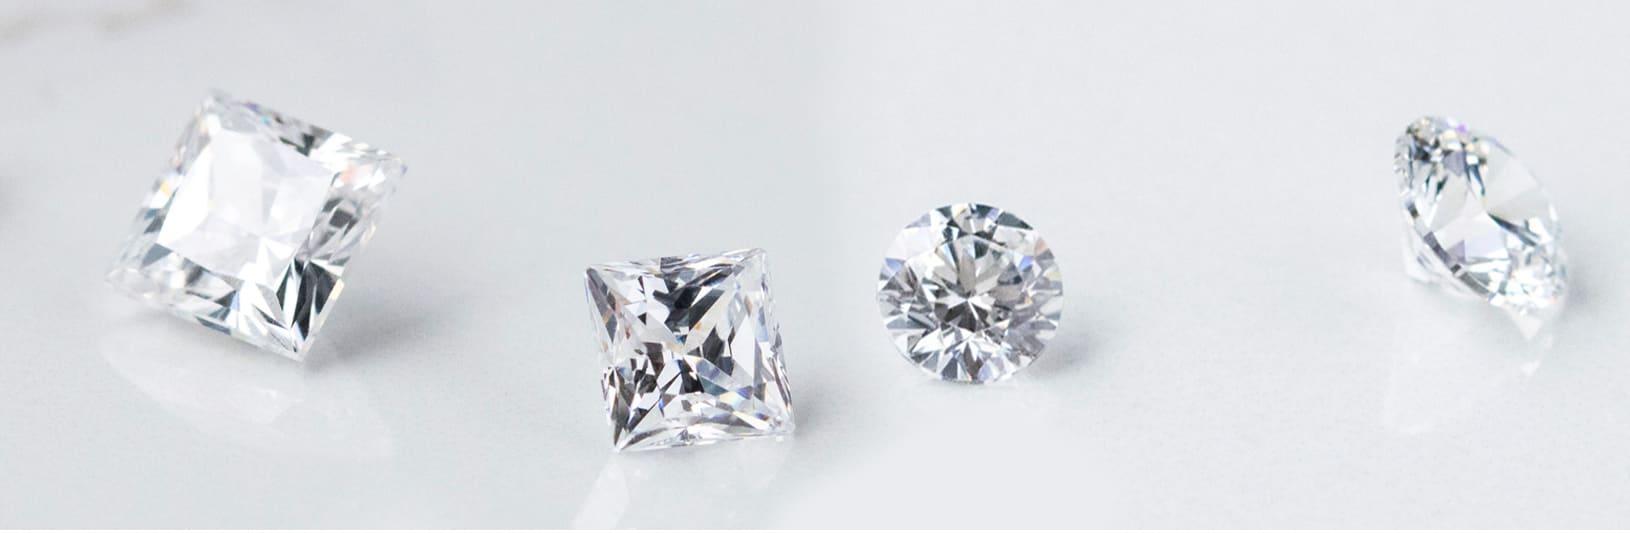 Several round cut and princess cut lab grown diamonds